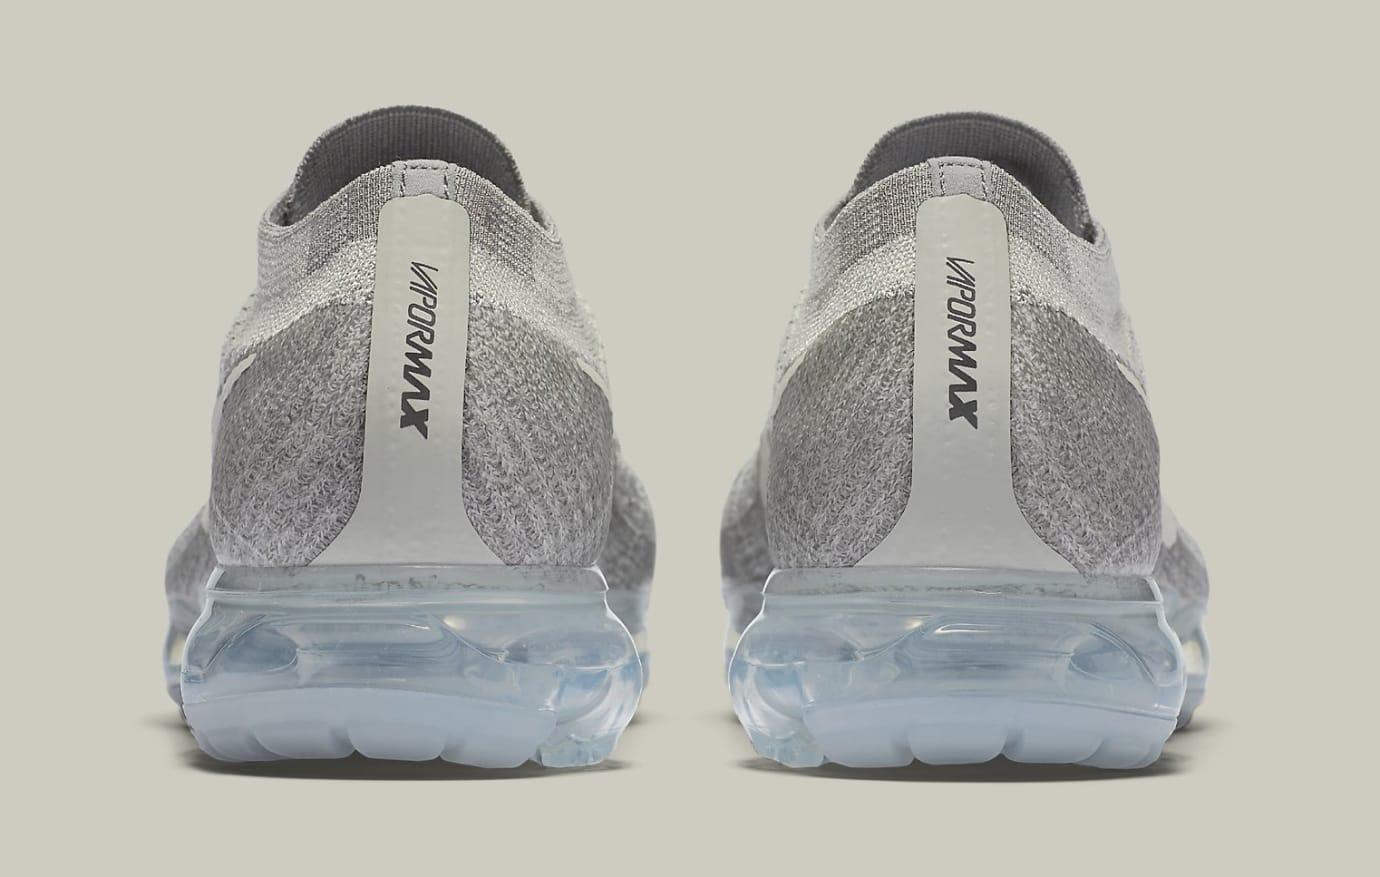 Nike Air VaporMax Pale Grey 849558-005 Heel